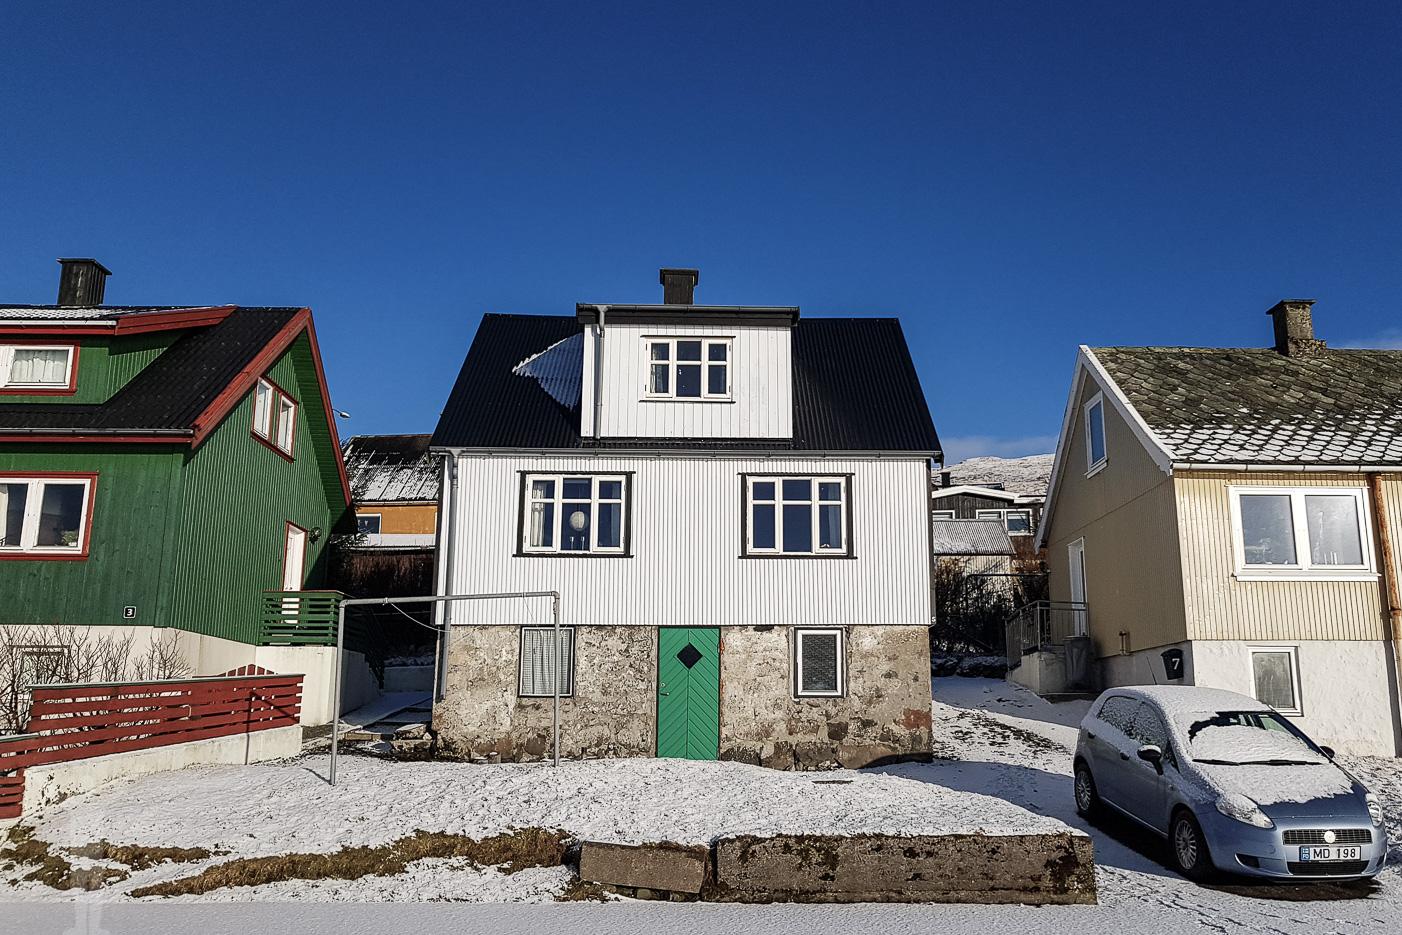 Eget hus på Färöarna, i Miðvágur, hyrt via Airbnb